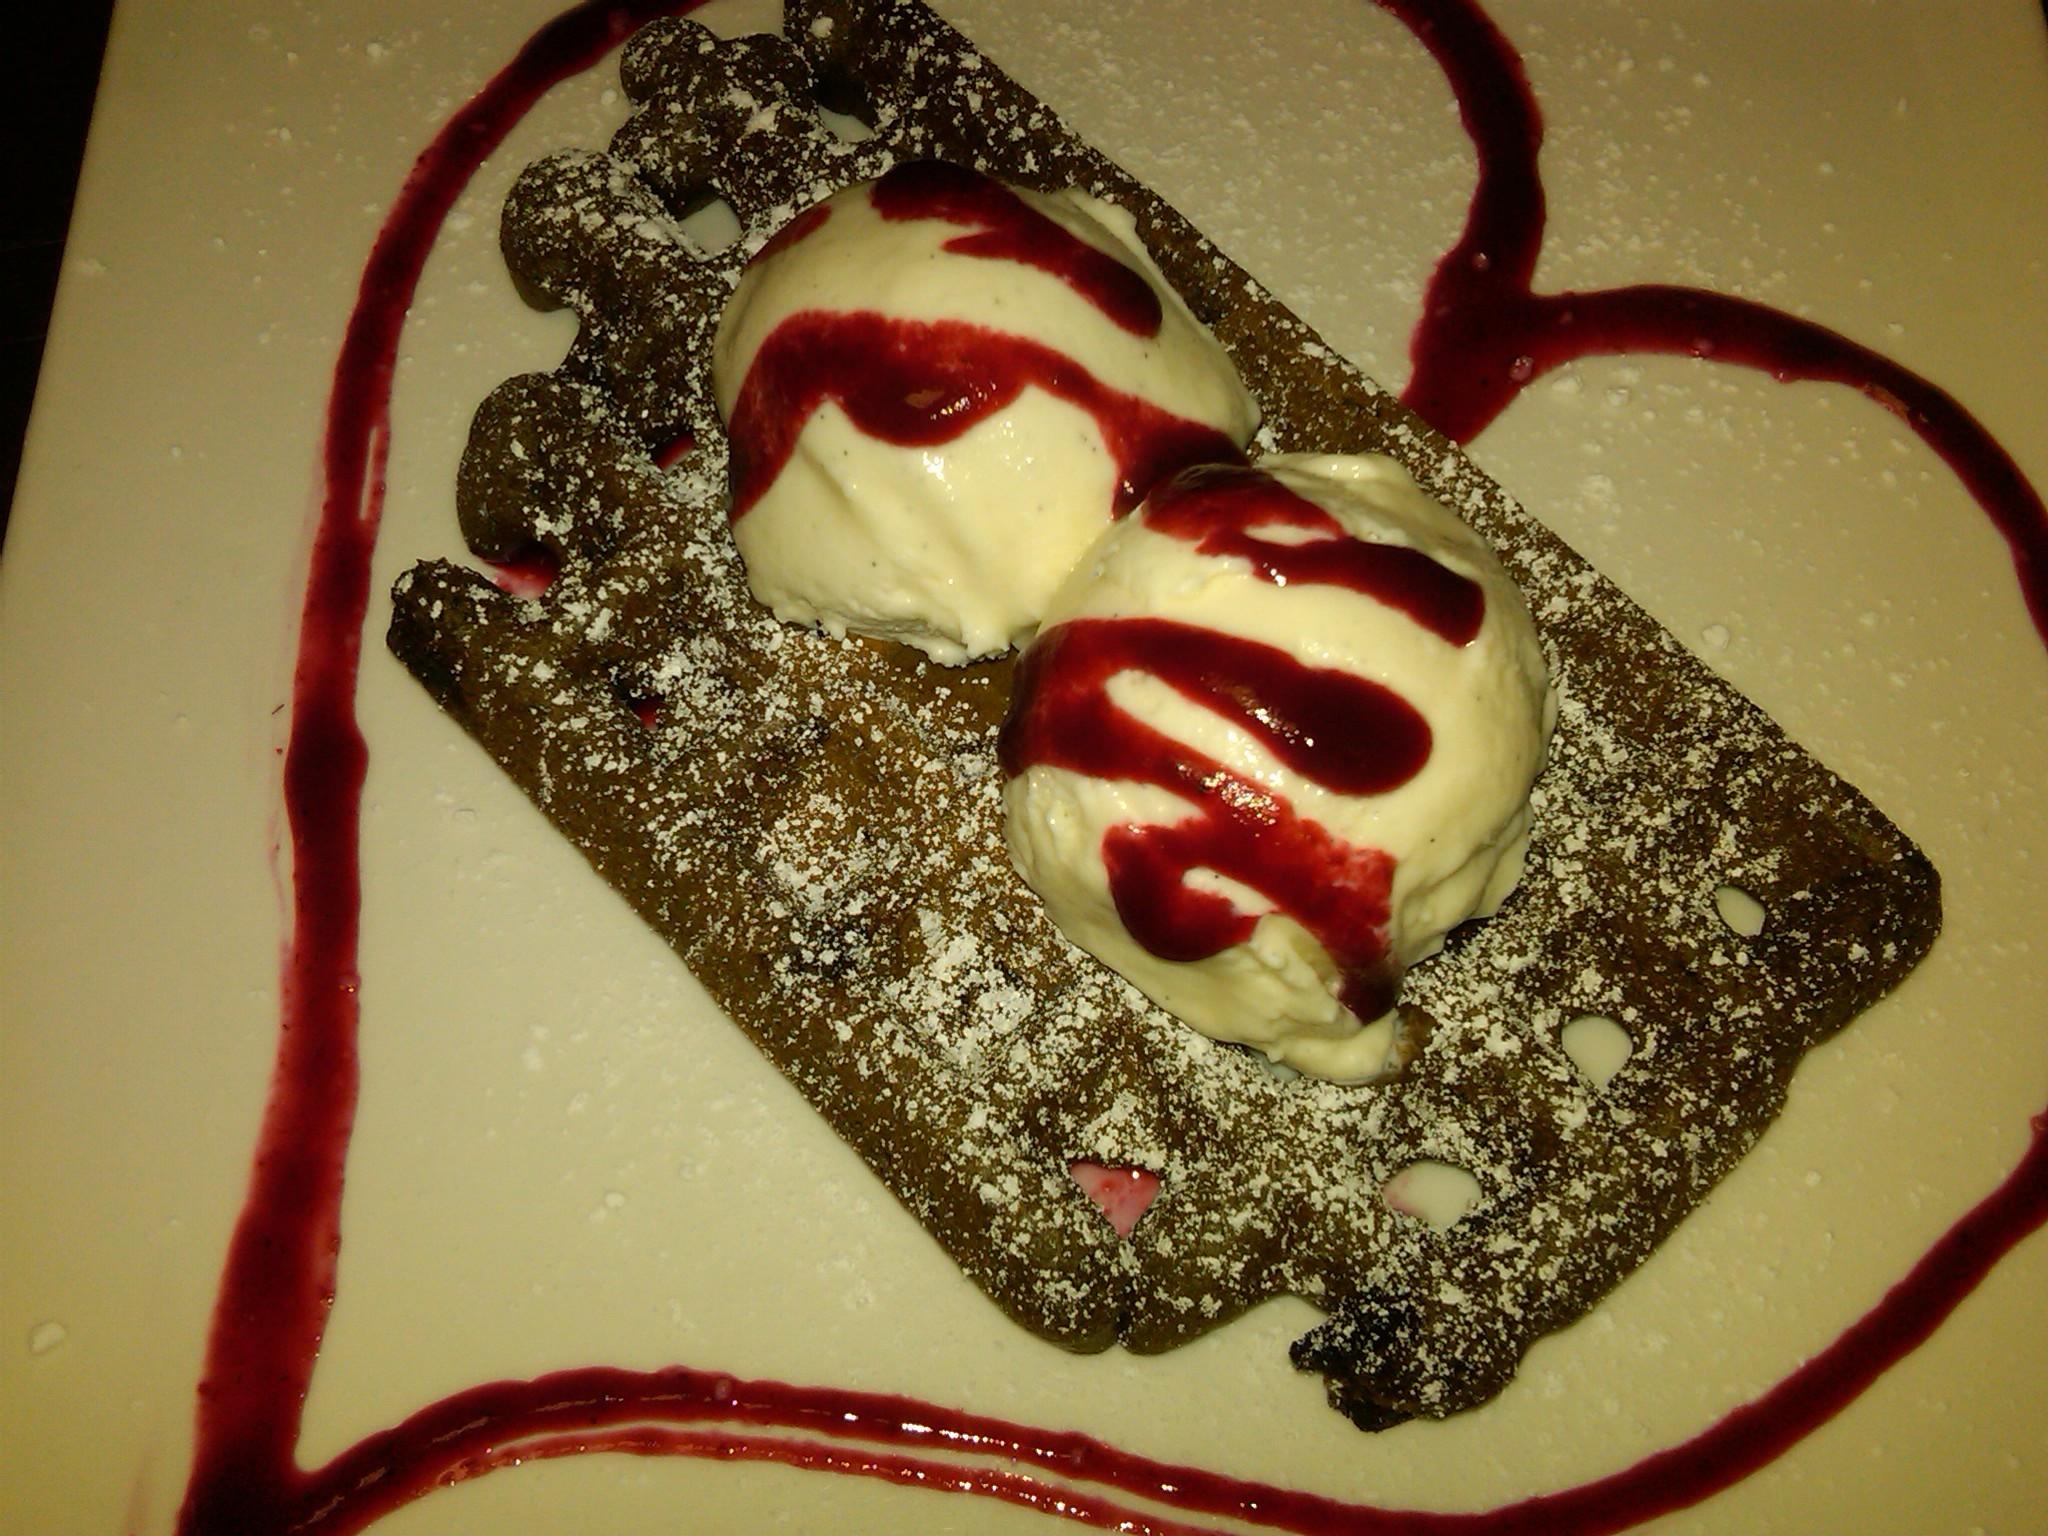 44006be1a7930672fc7c_bonte_dessert.jpg